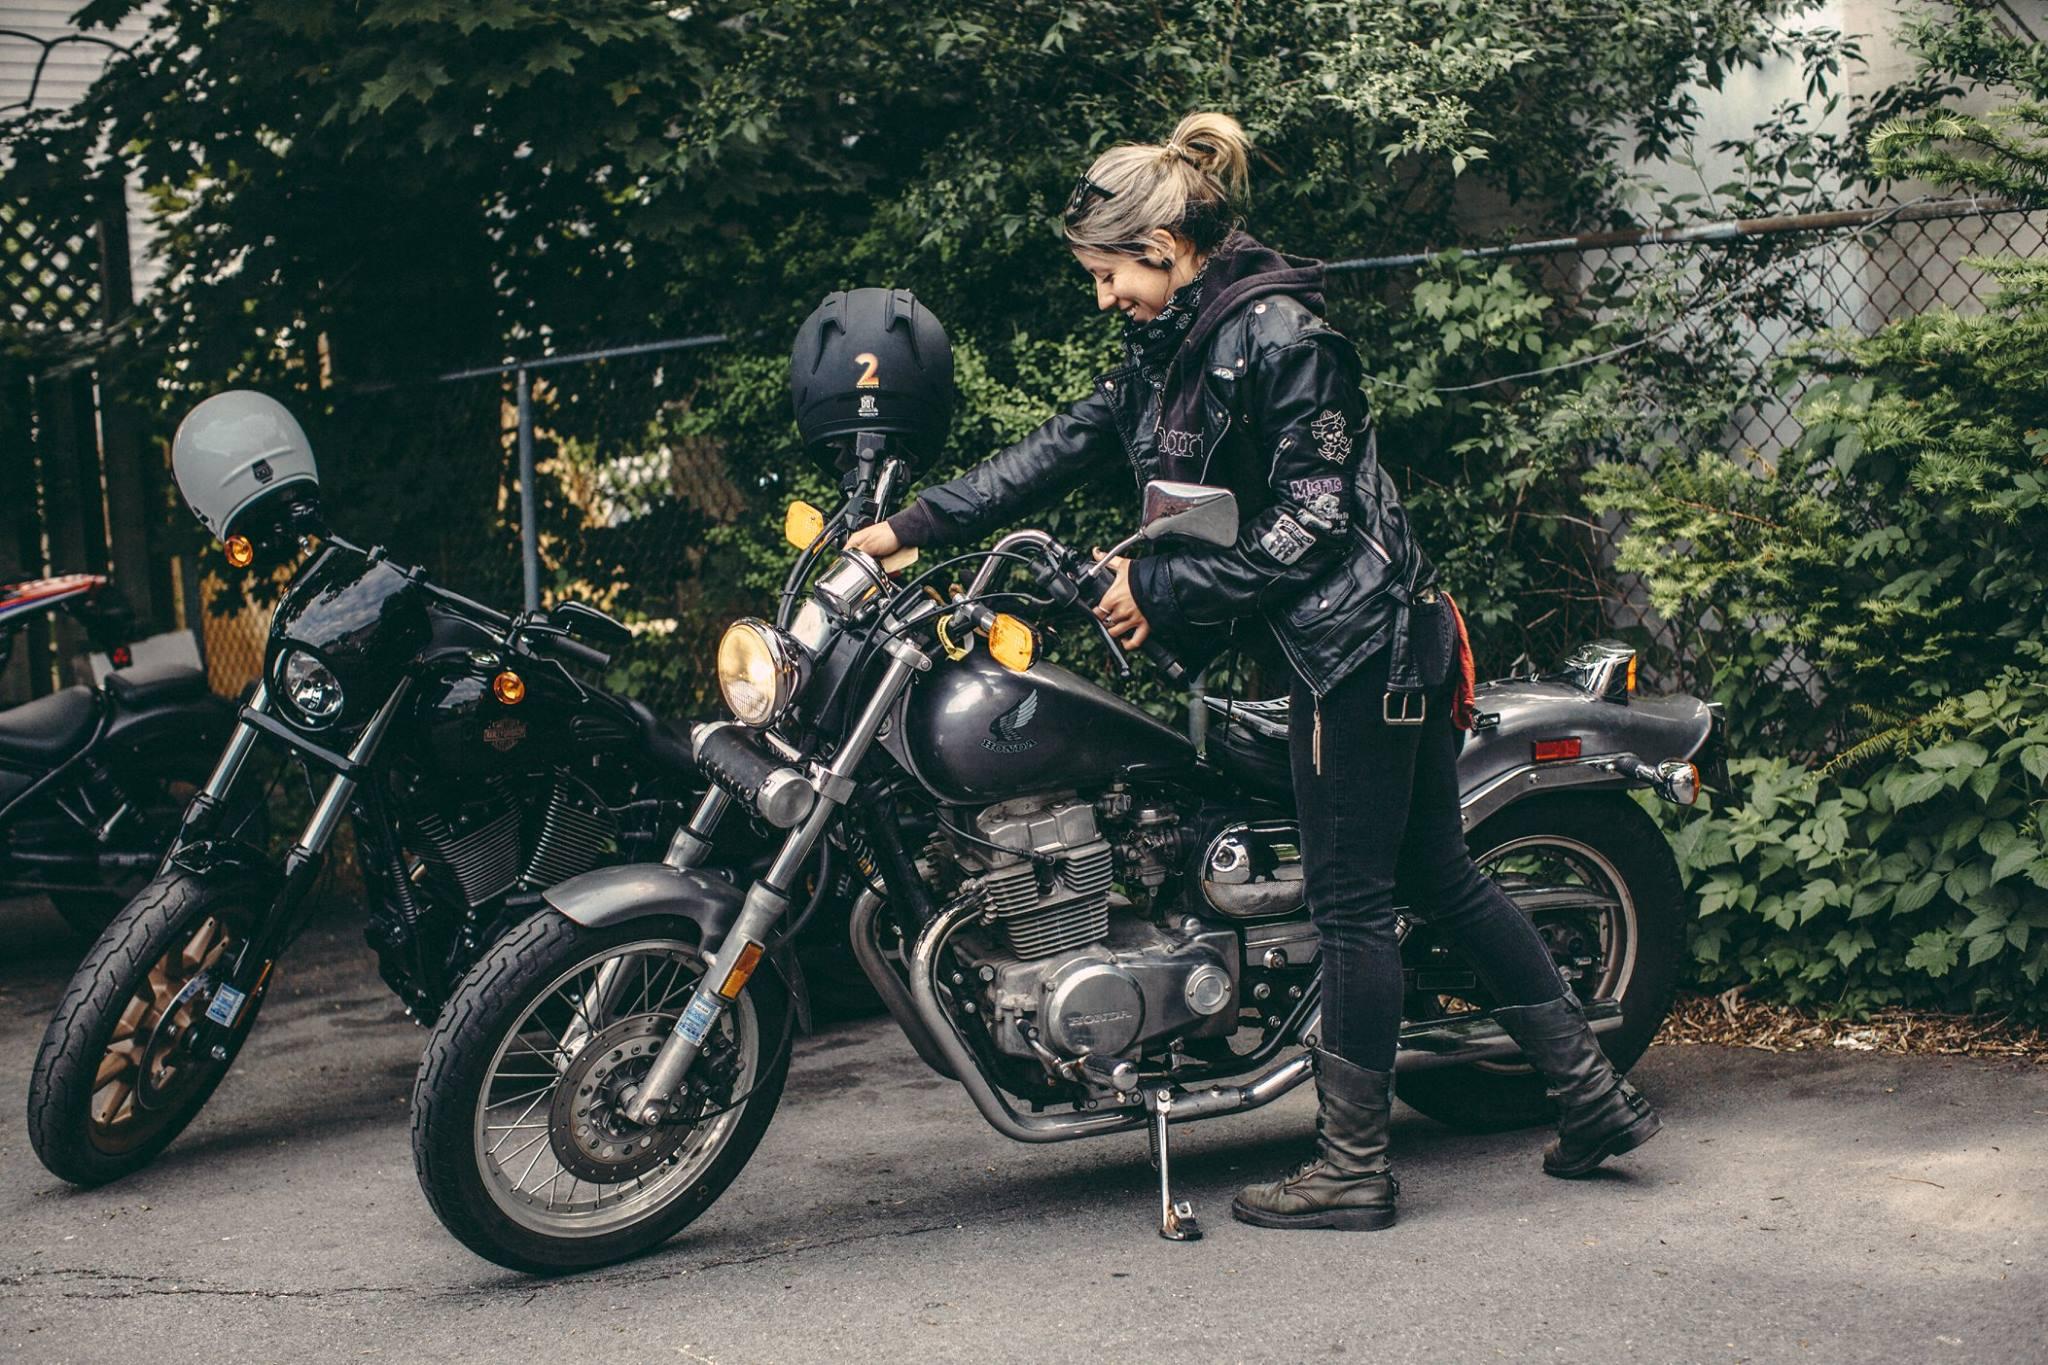 Kira's Ride | #TheMotoSocialHALIFAX